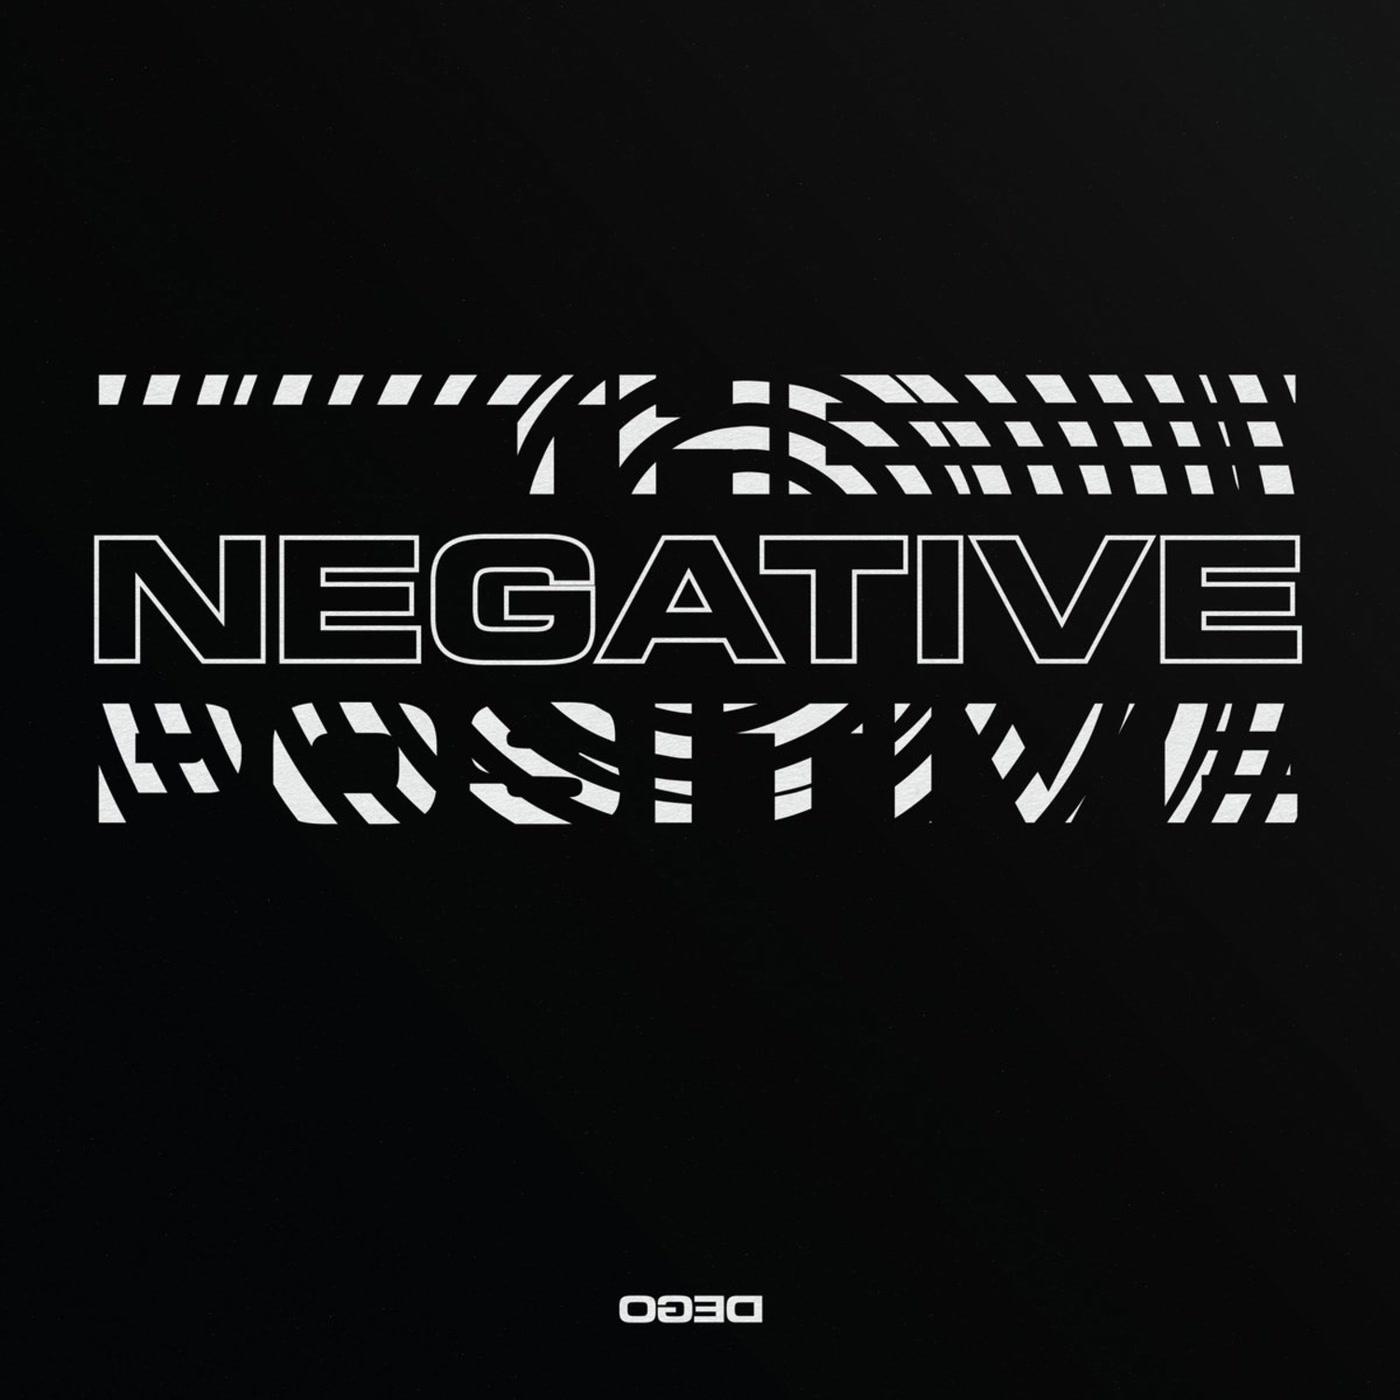 dego – The Negative Positive (2000black)